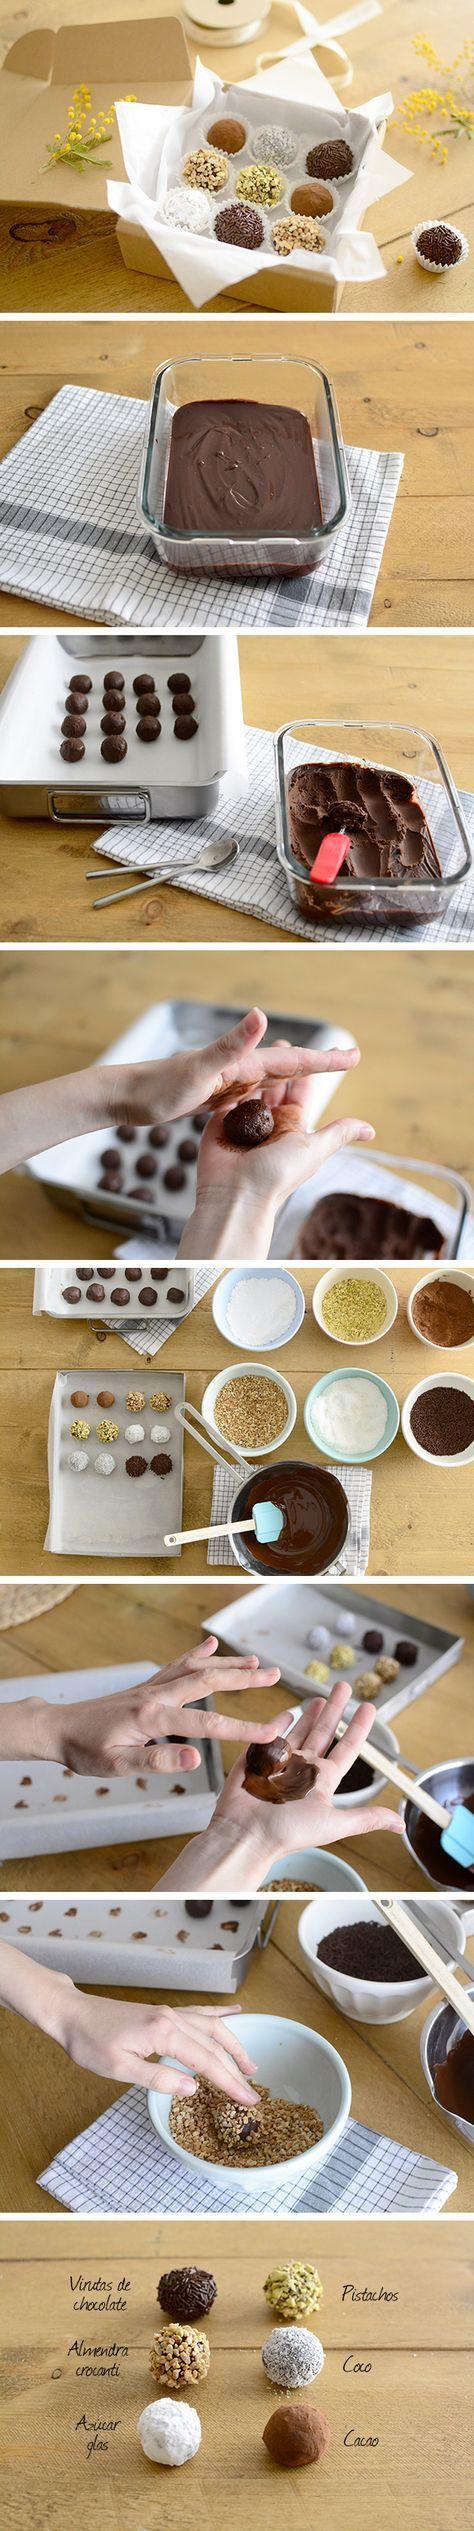 Chocolate truffles - Trufas de chocolate …